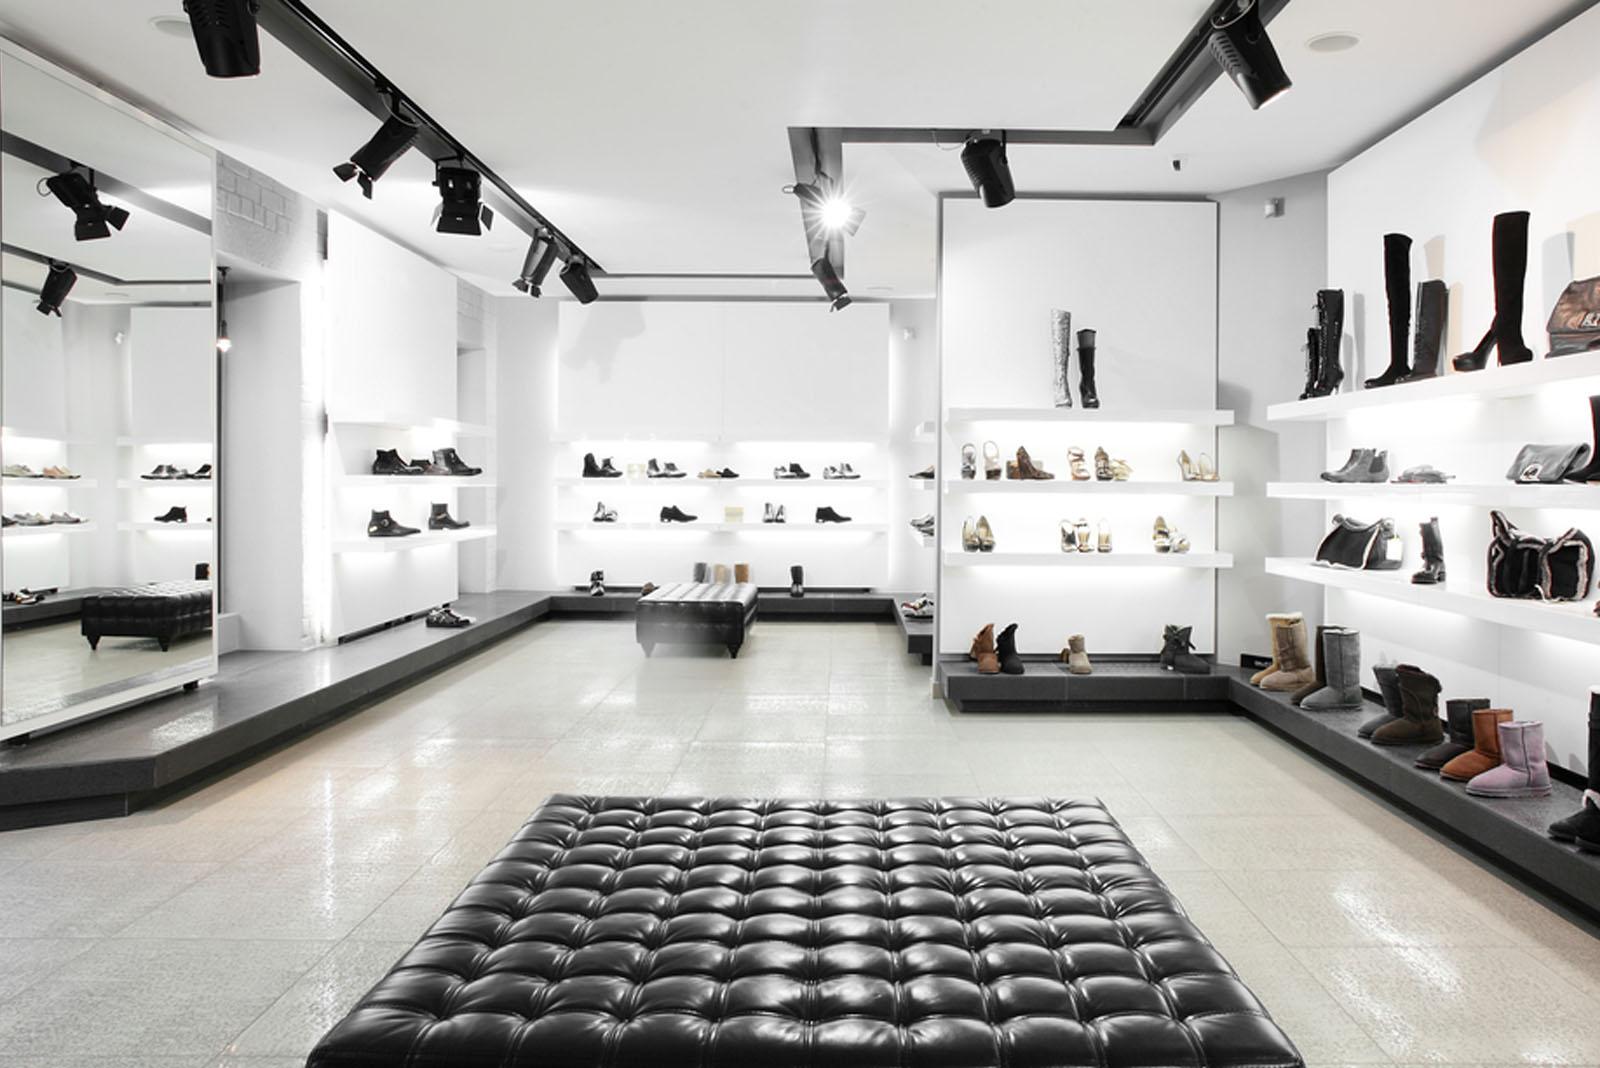 Showroom design Kincir Bali WP 3